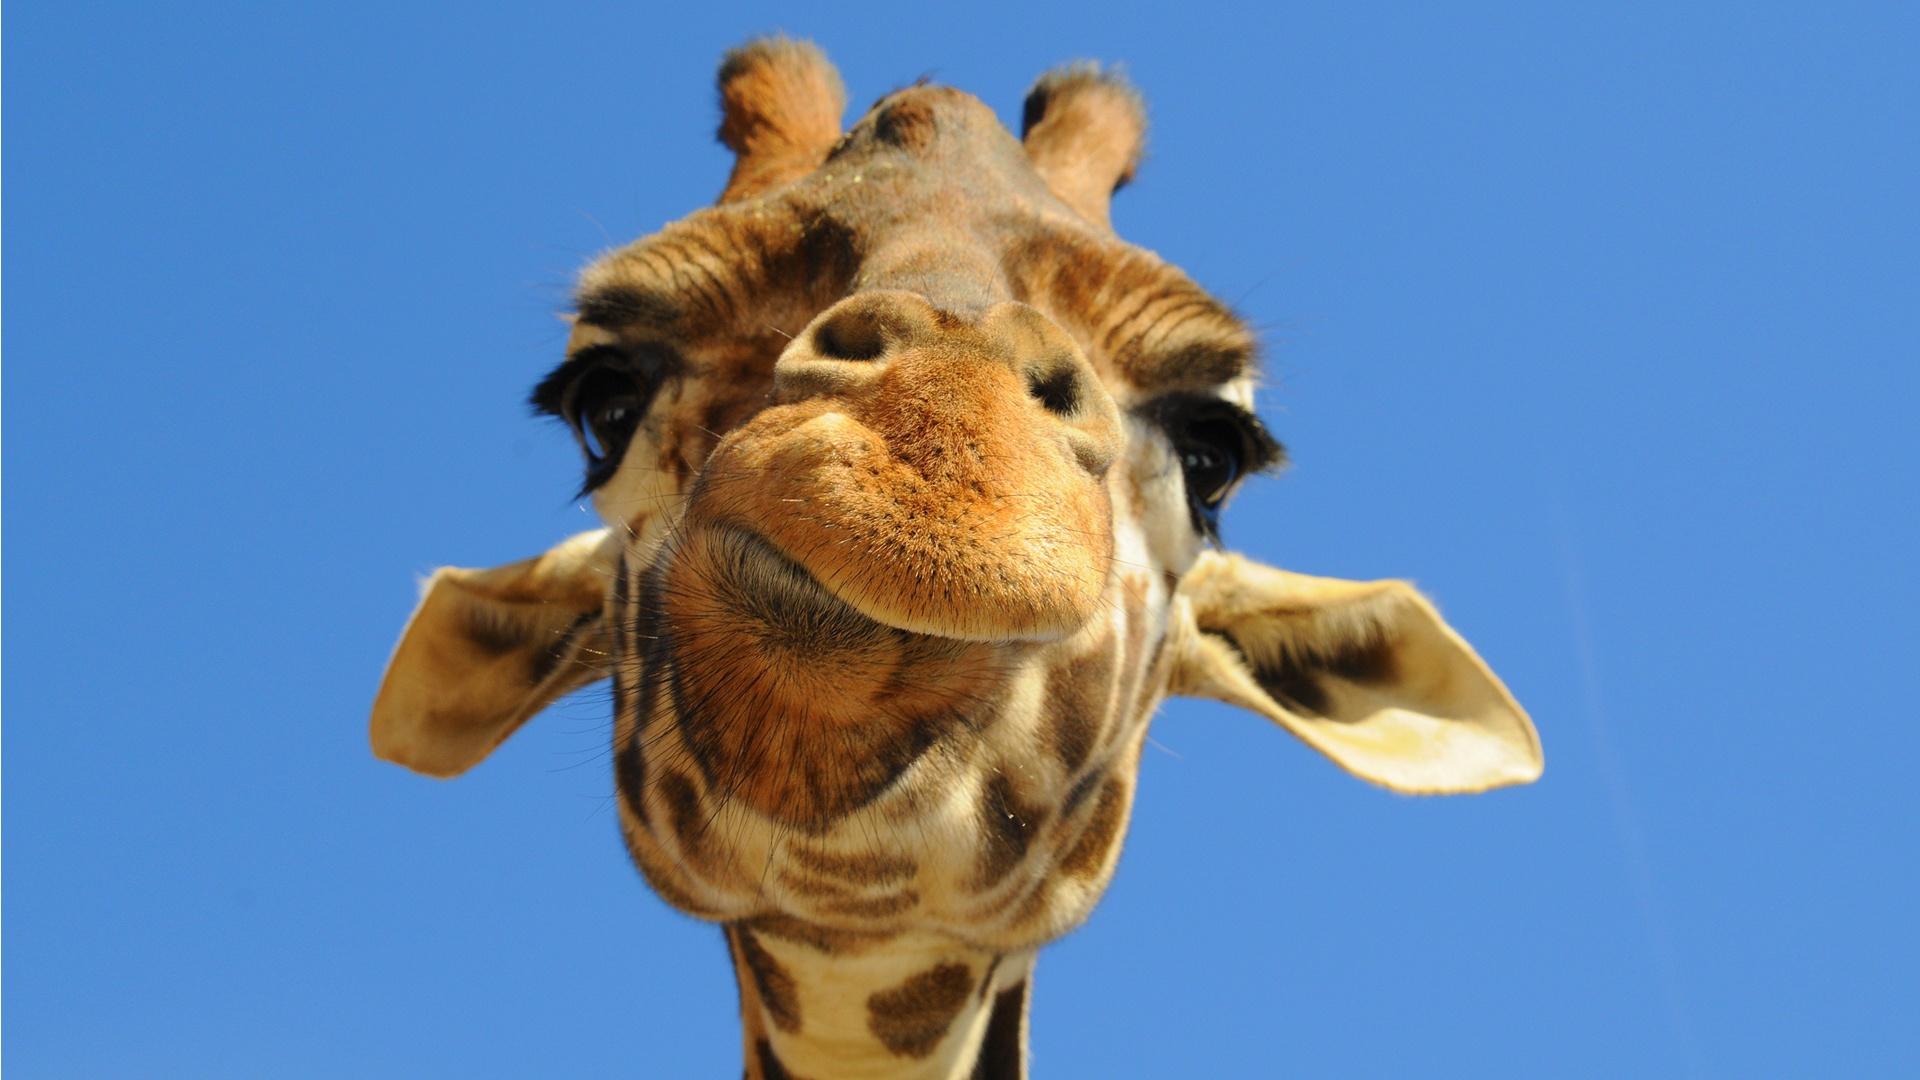 kartinki24_ru_animals_giraffes_0002.jpg